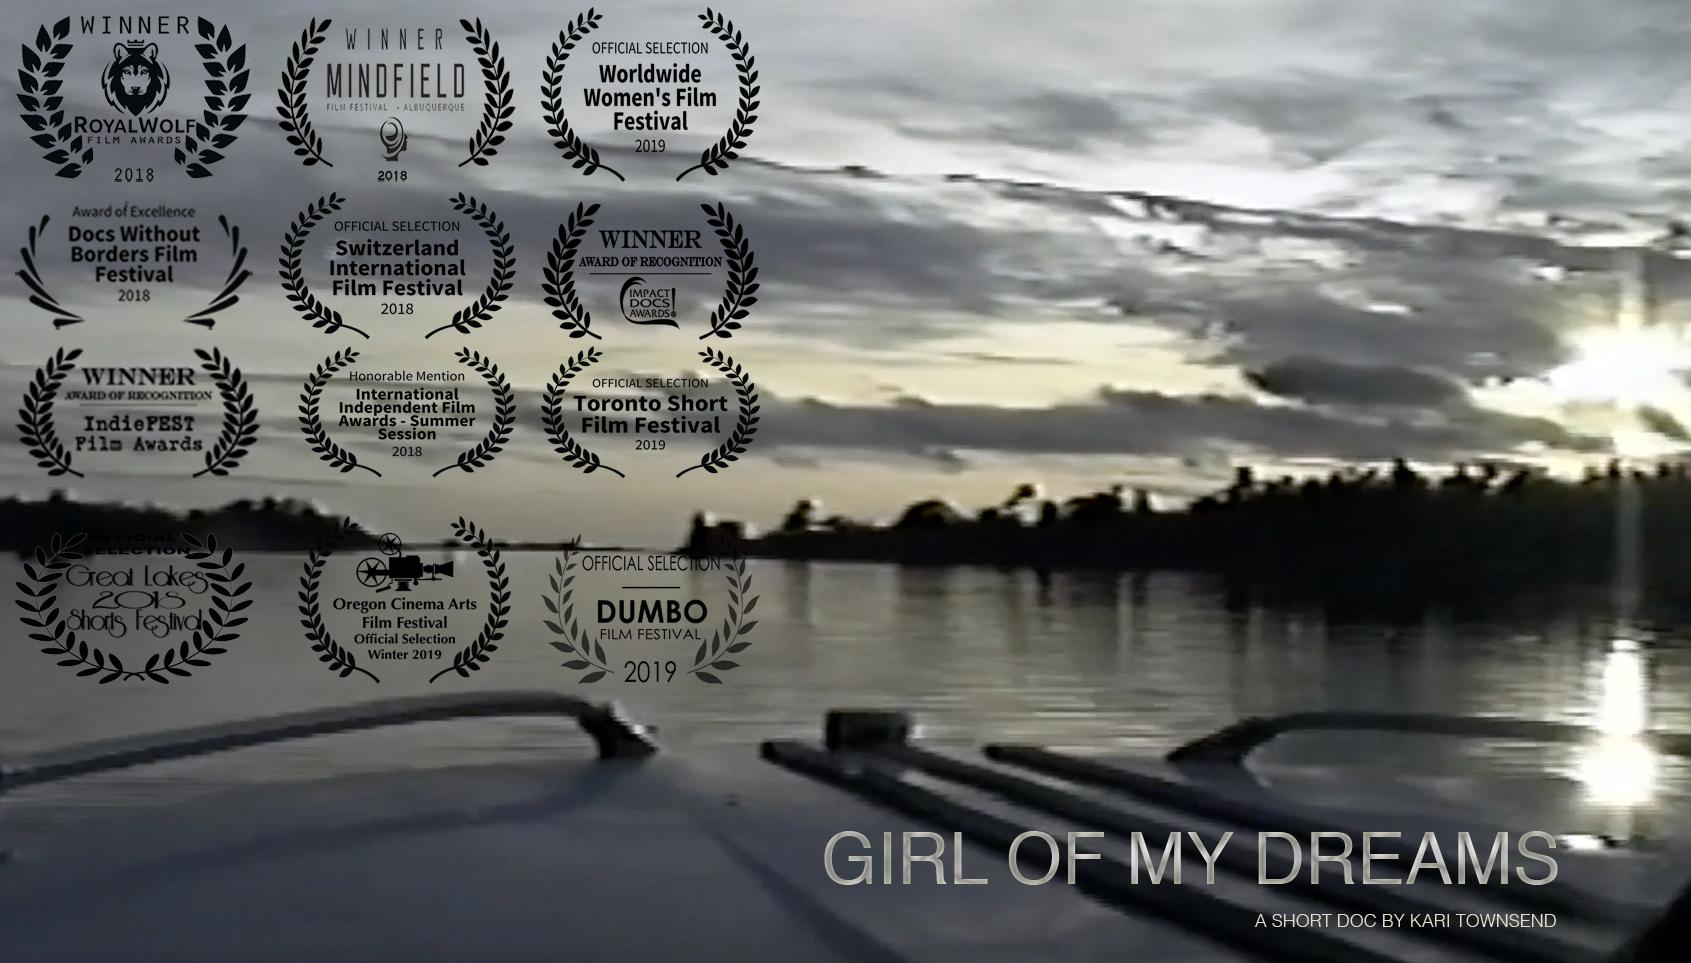 Girl of my Dreams poster_July2019.jpg